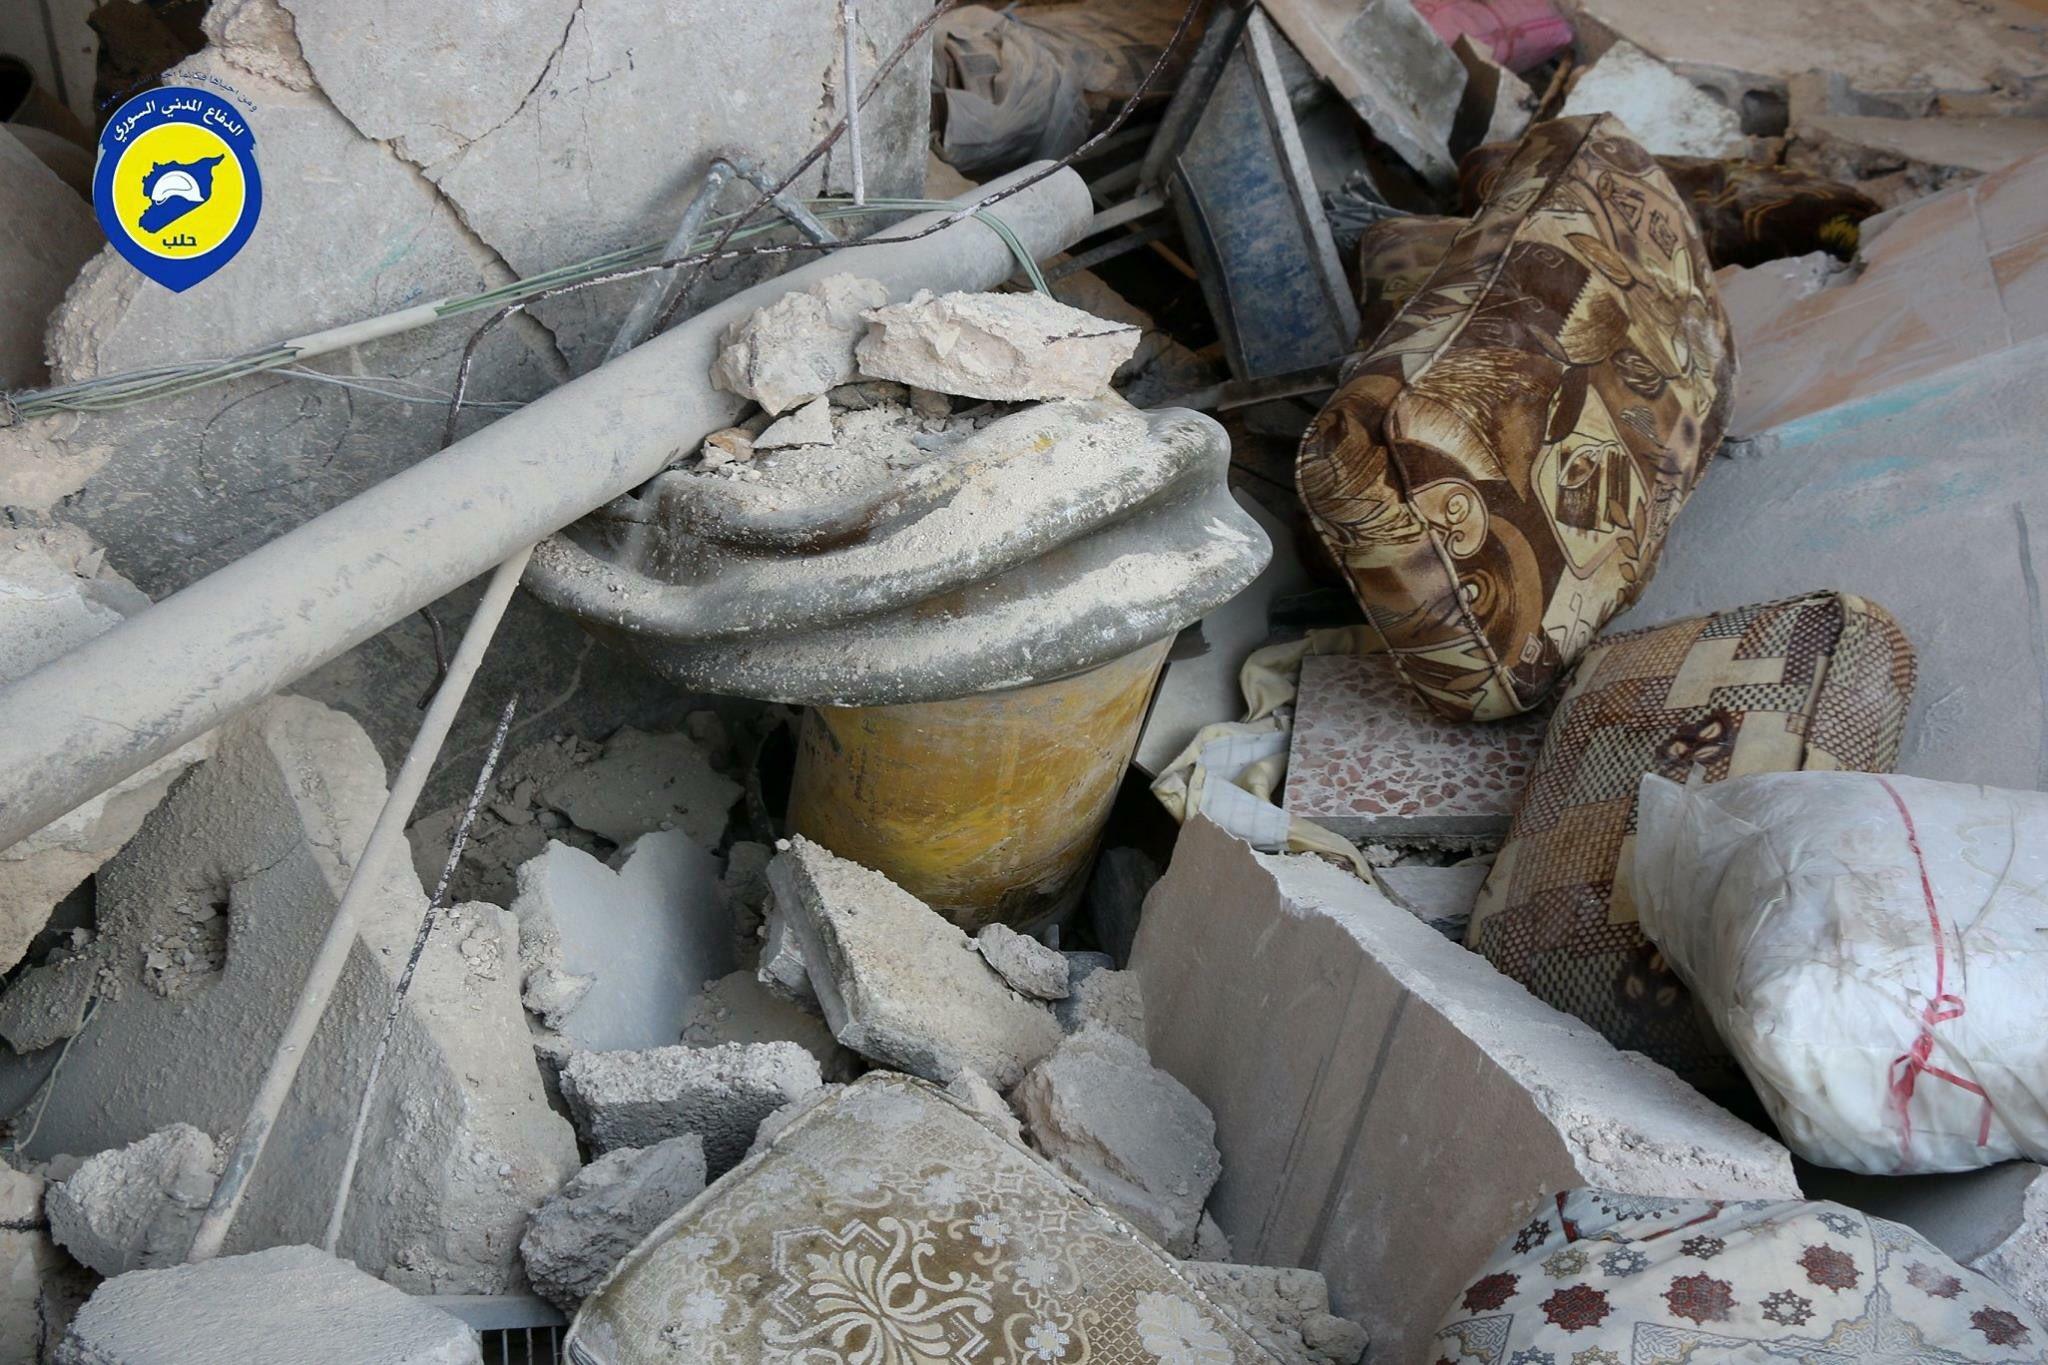 20 November 2016: Al-Sakhour, Aleppo (Source: Syria Civil Defense 2016)